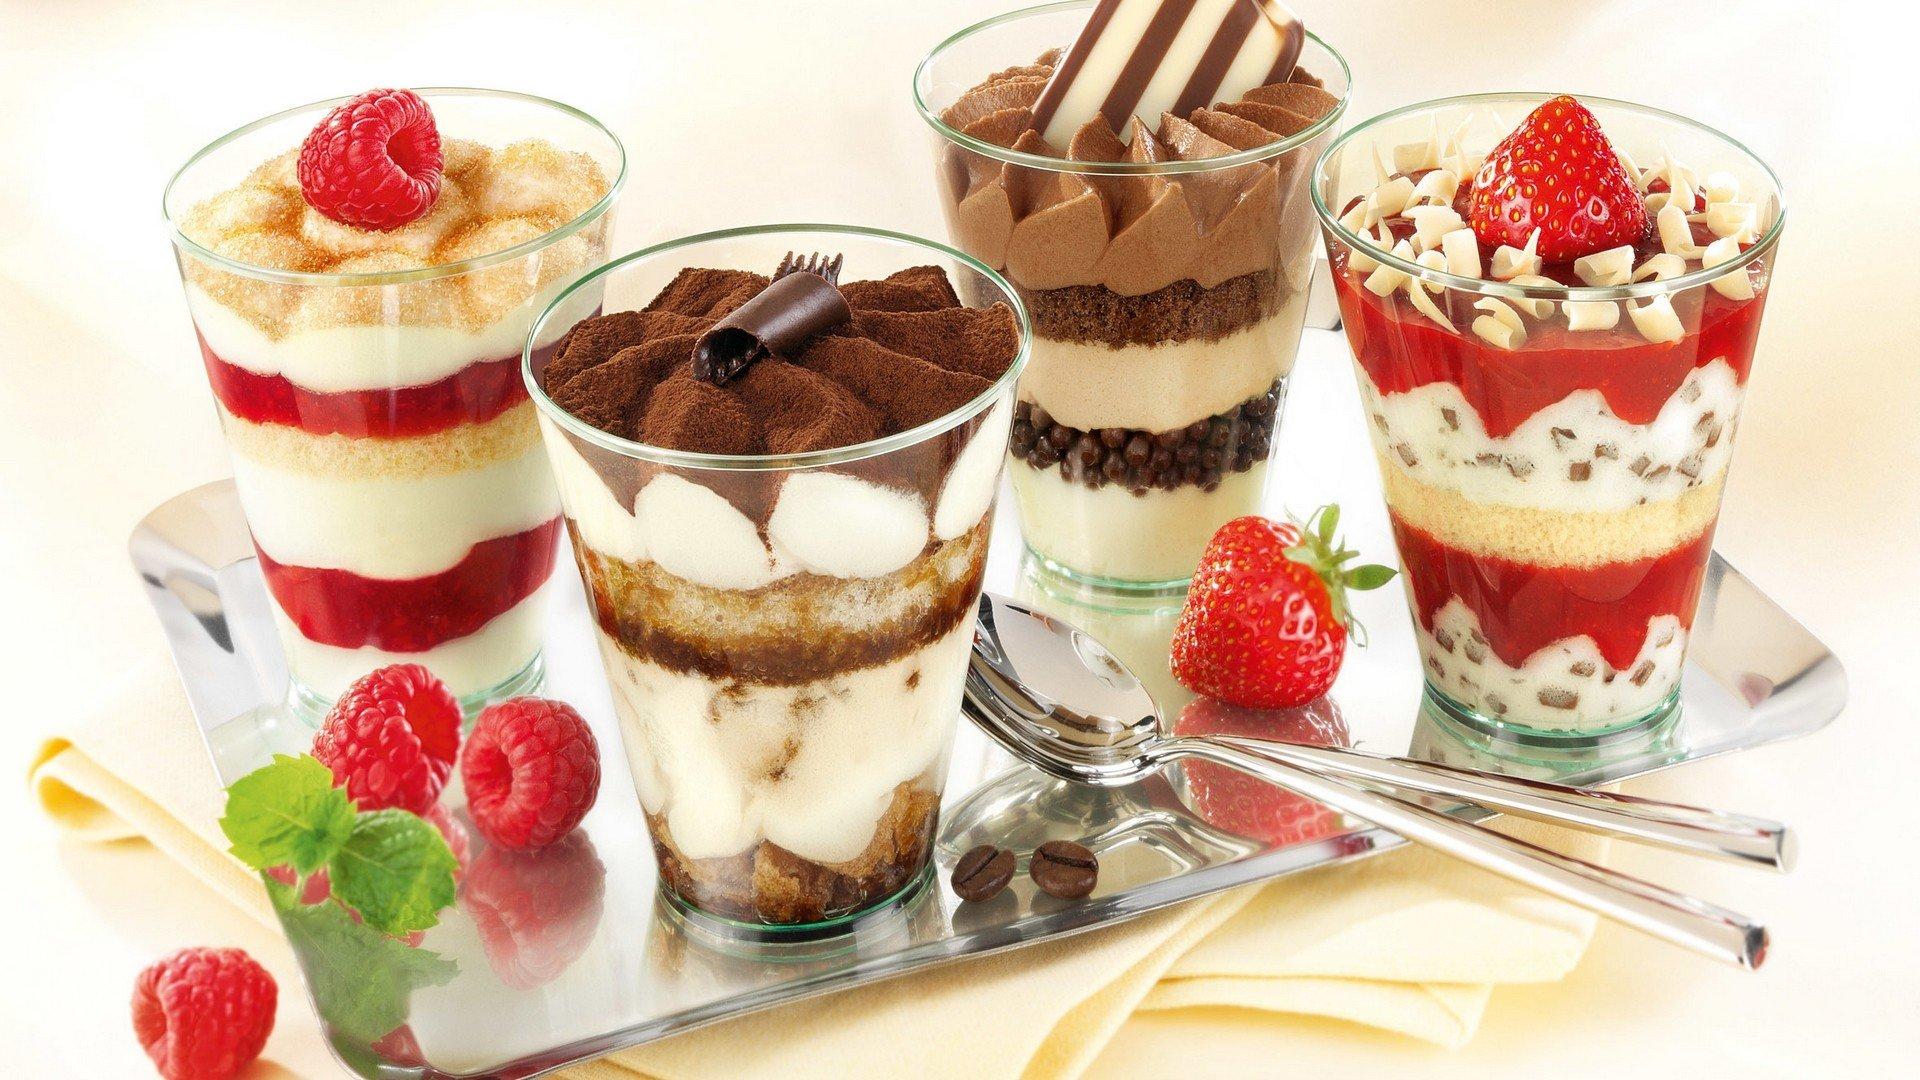 ice cream wallpaper for facebook - photo #17